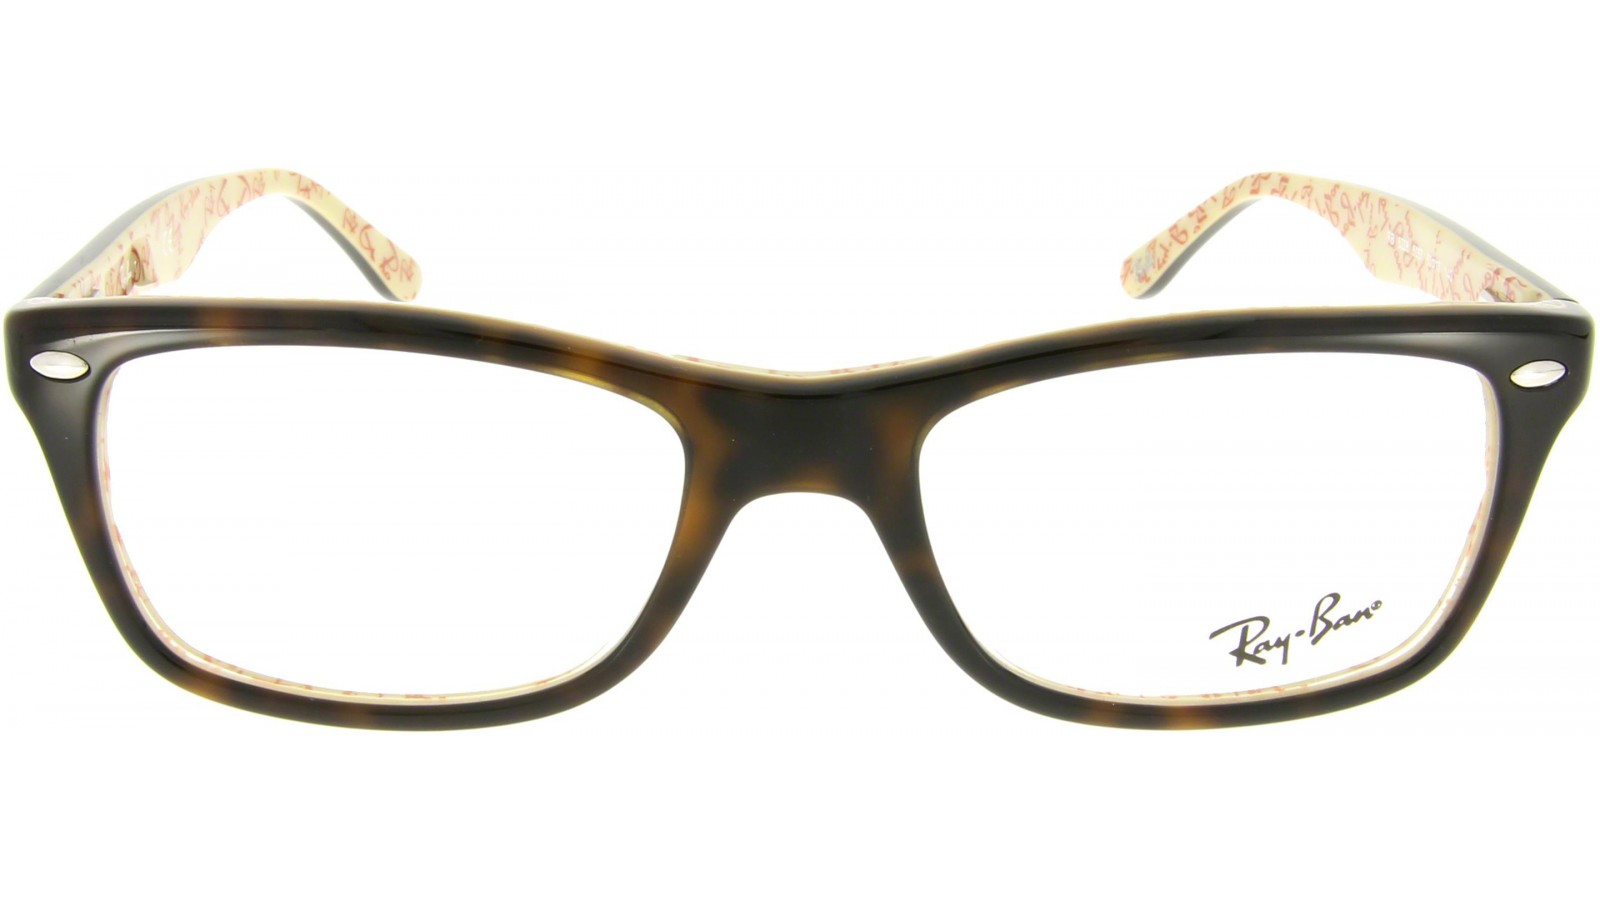 ray ban brille braun grün